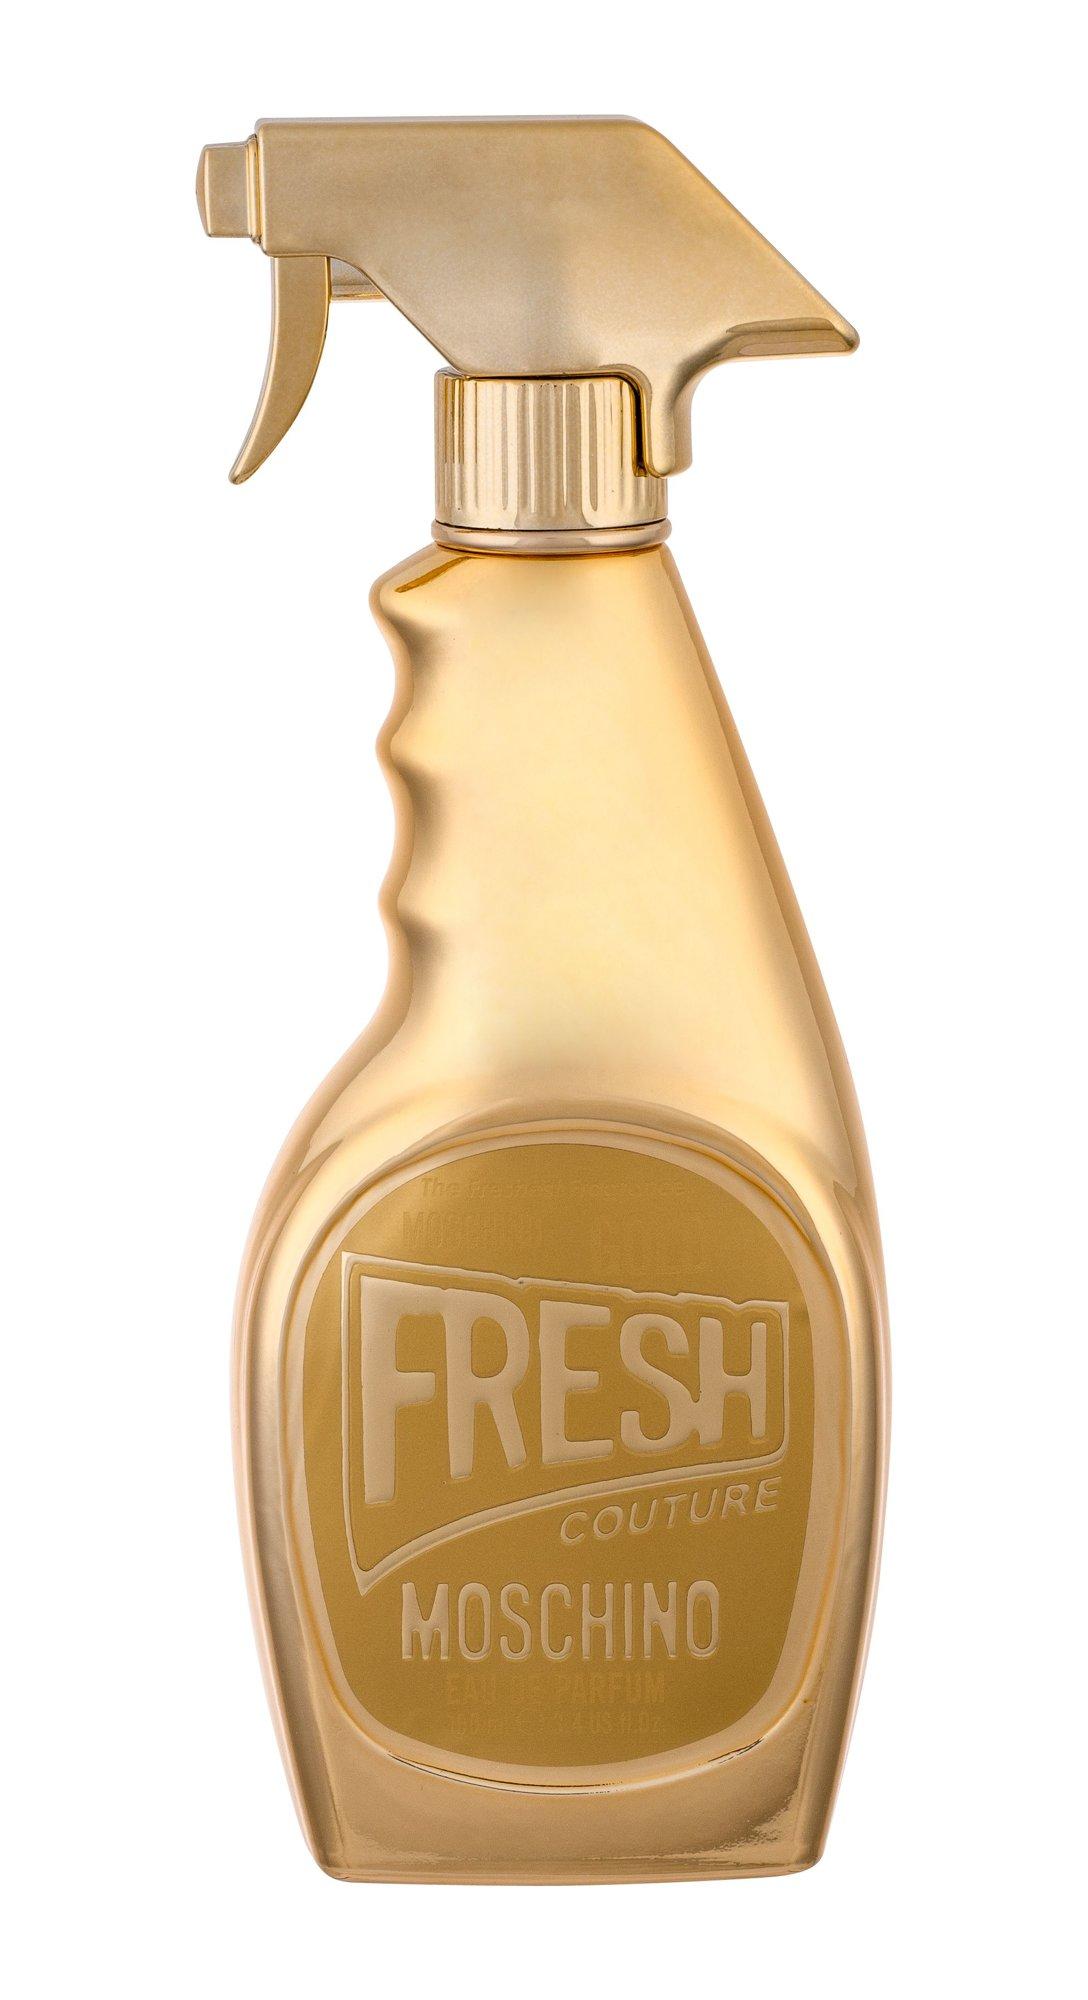 Moschino Fresh Gold Couture Eau de Toilette 100ml